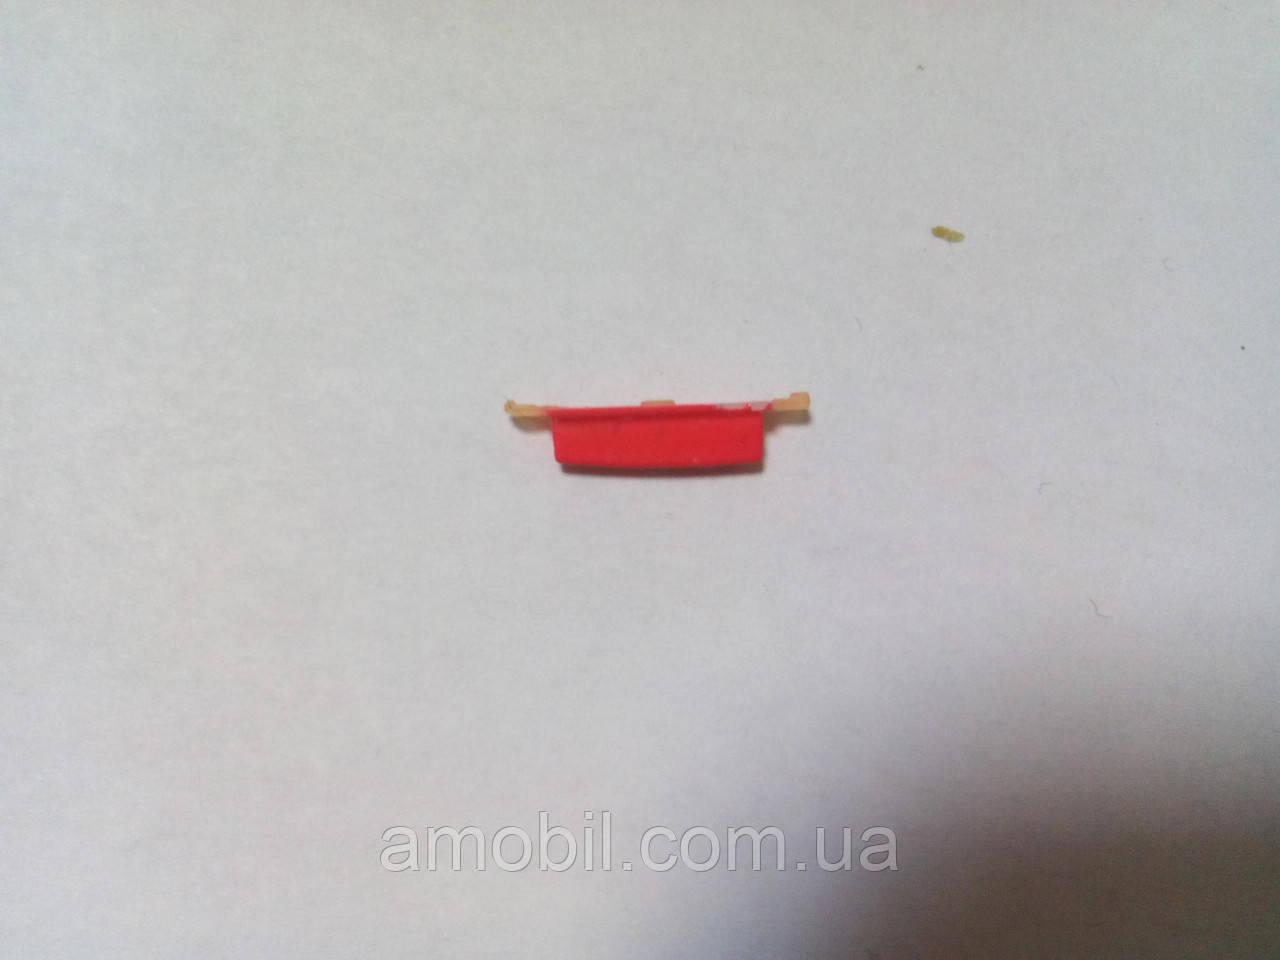 Кнопка включения на Lenovo S820 красная orig